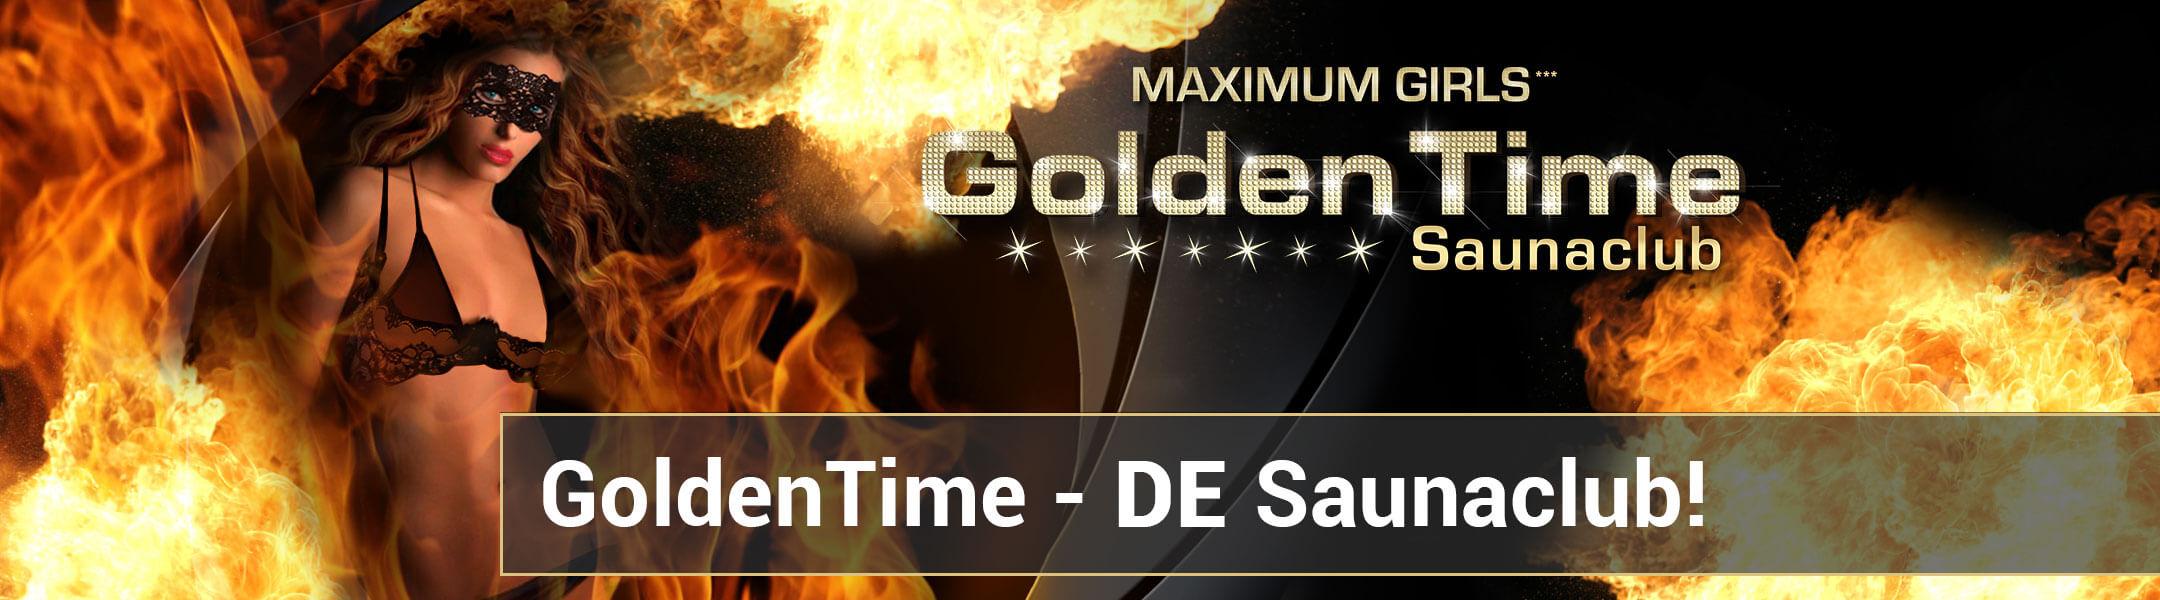 GoldenTime – DE Saunaclub!